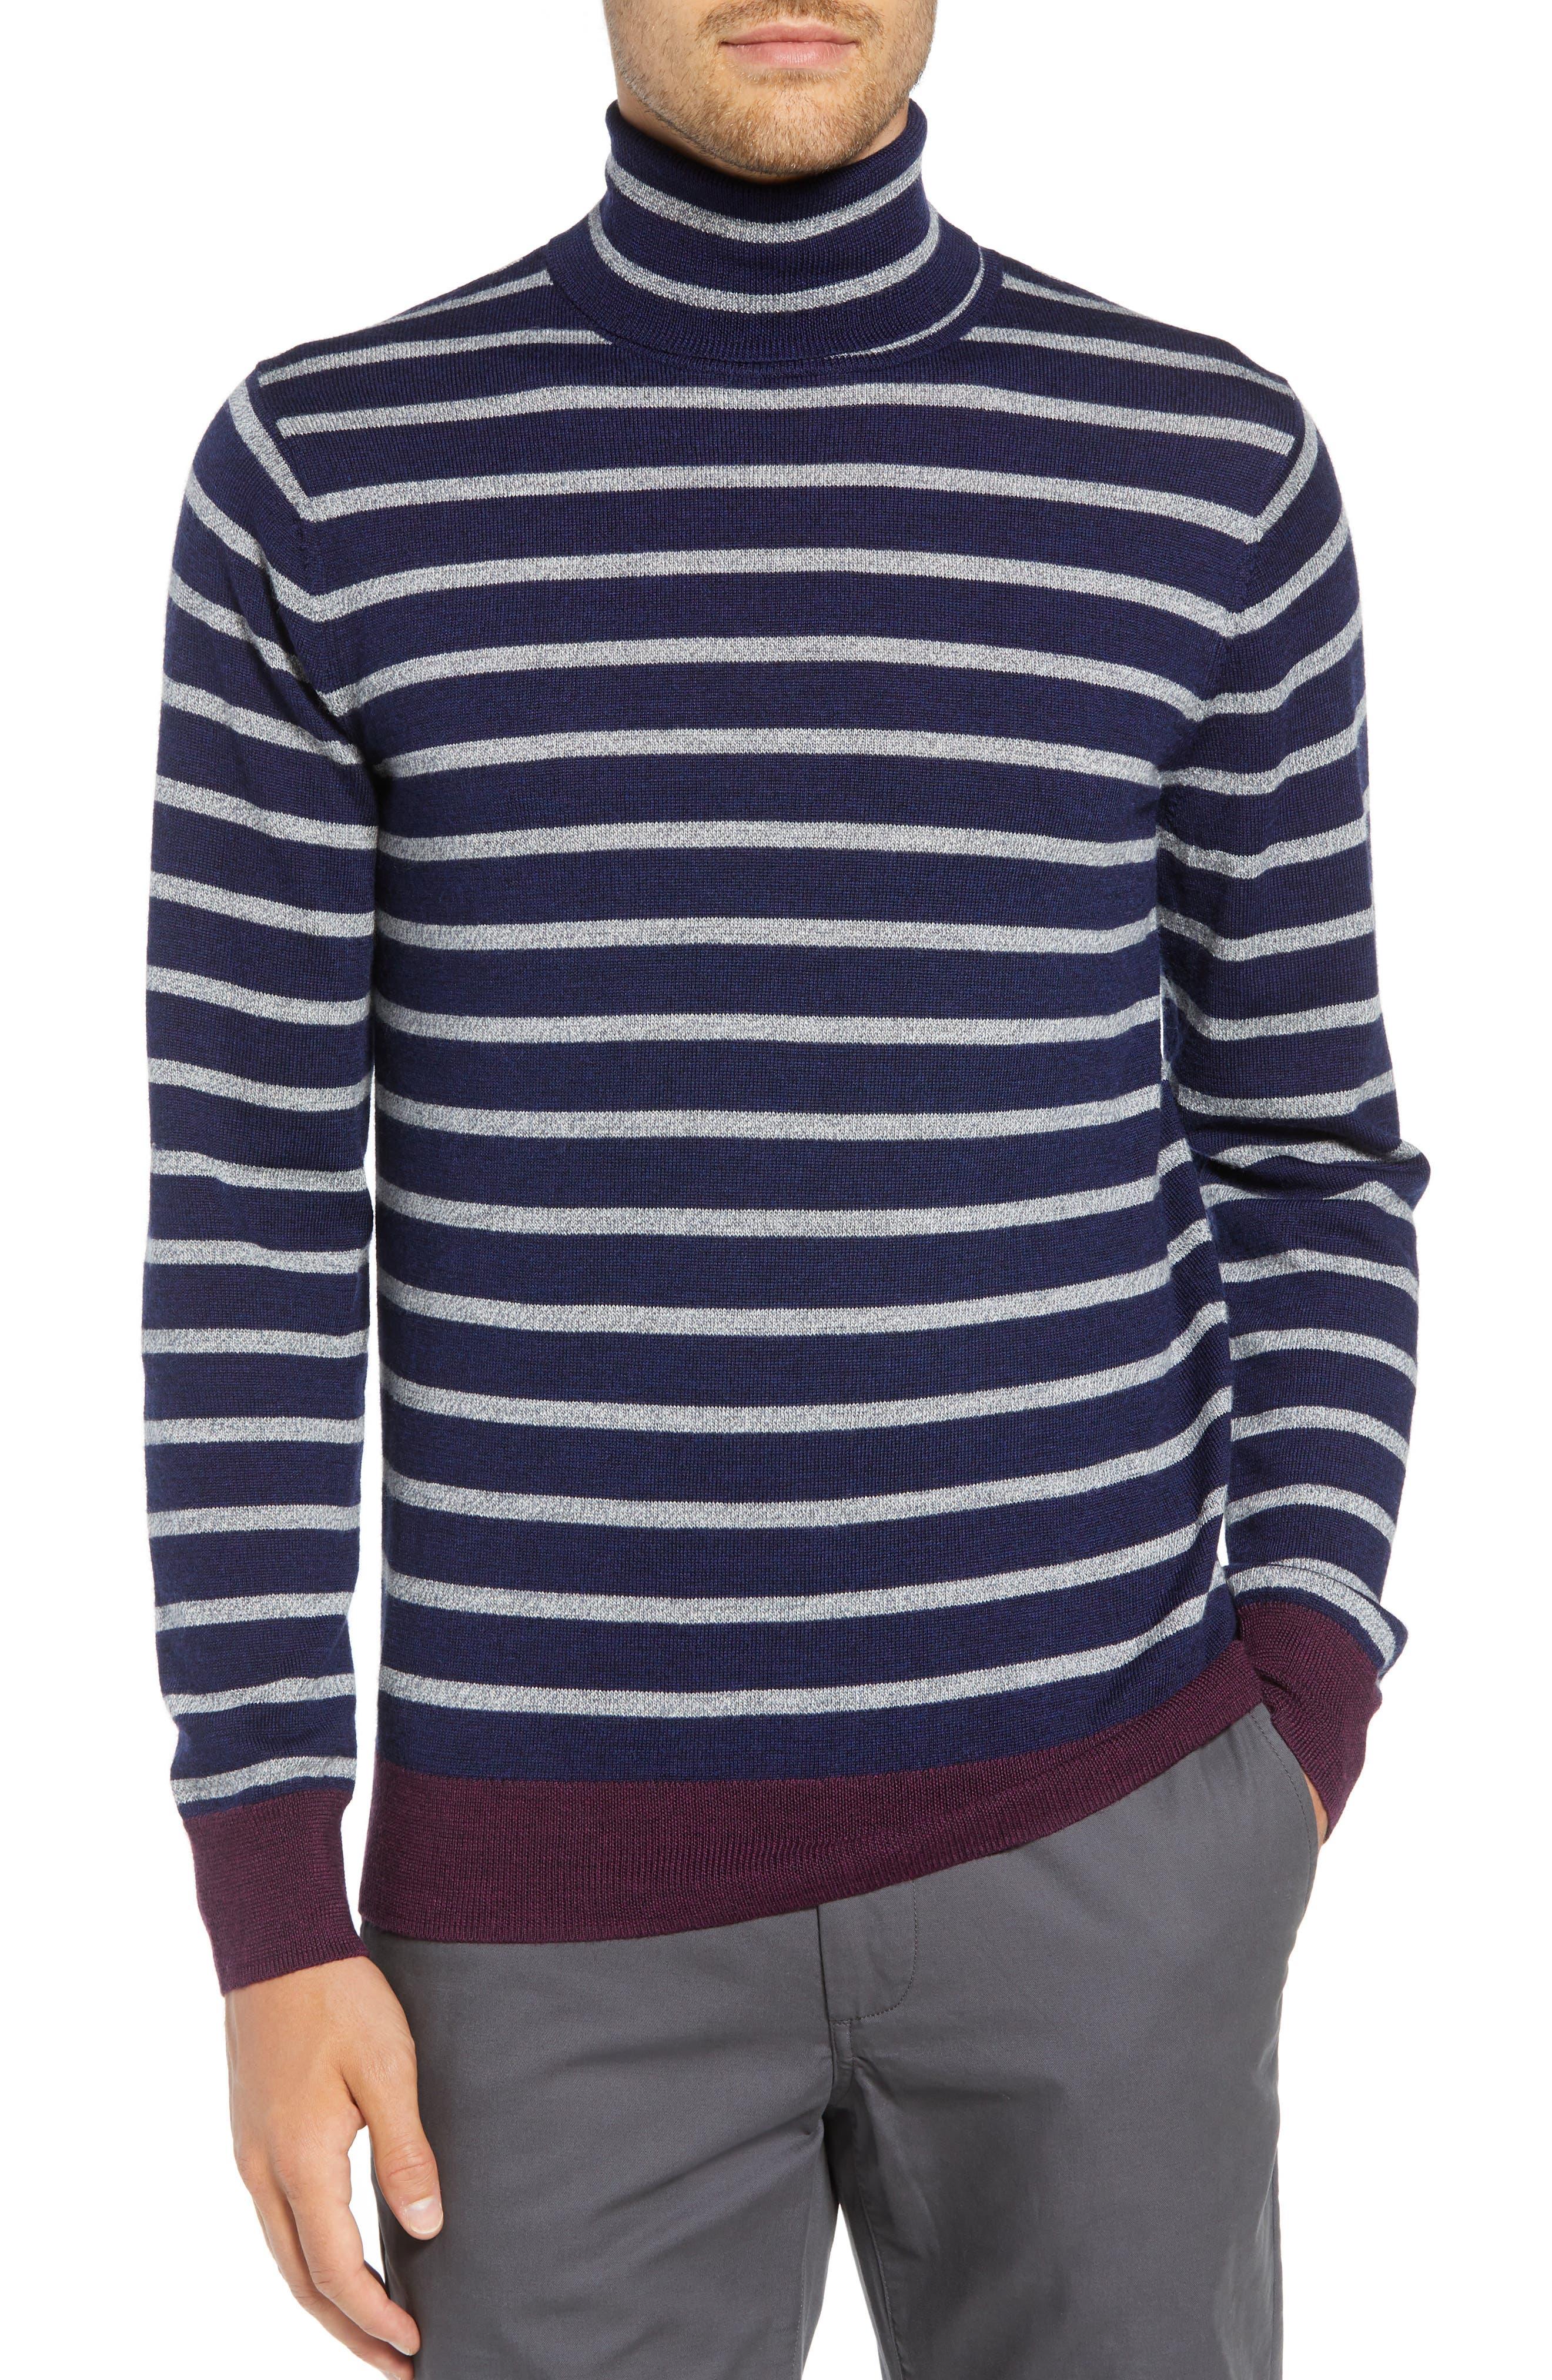 Slim Fit Turtleneck Merino Wool Sweater,                             Main thumbnail 1, color,                             HEATHER INK/ COOL GREY